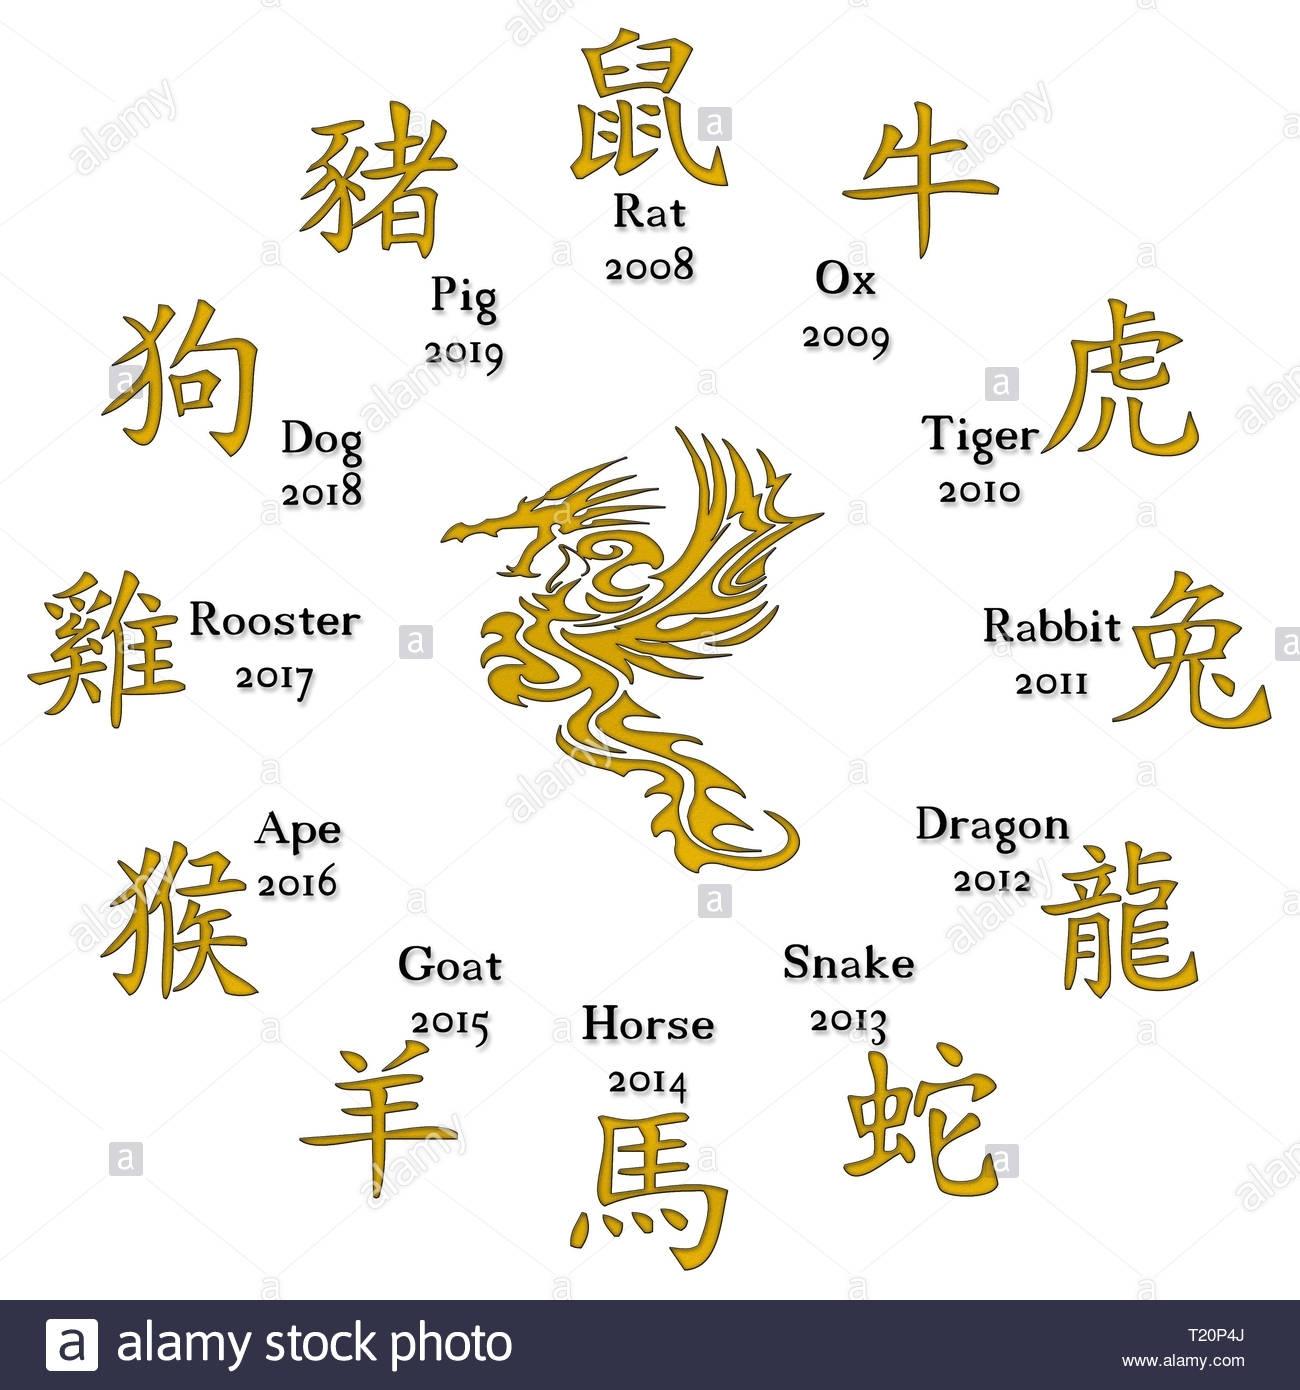 Chinese Calendar With Animal Signs Stock Photo - Alamy Lunar Calendar Zodiac Signs